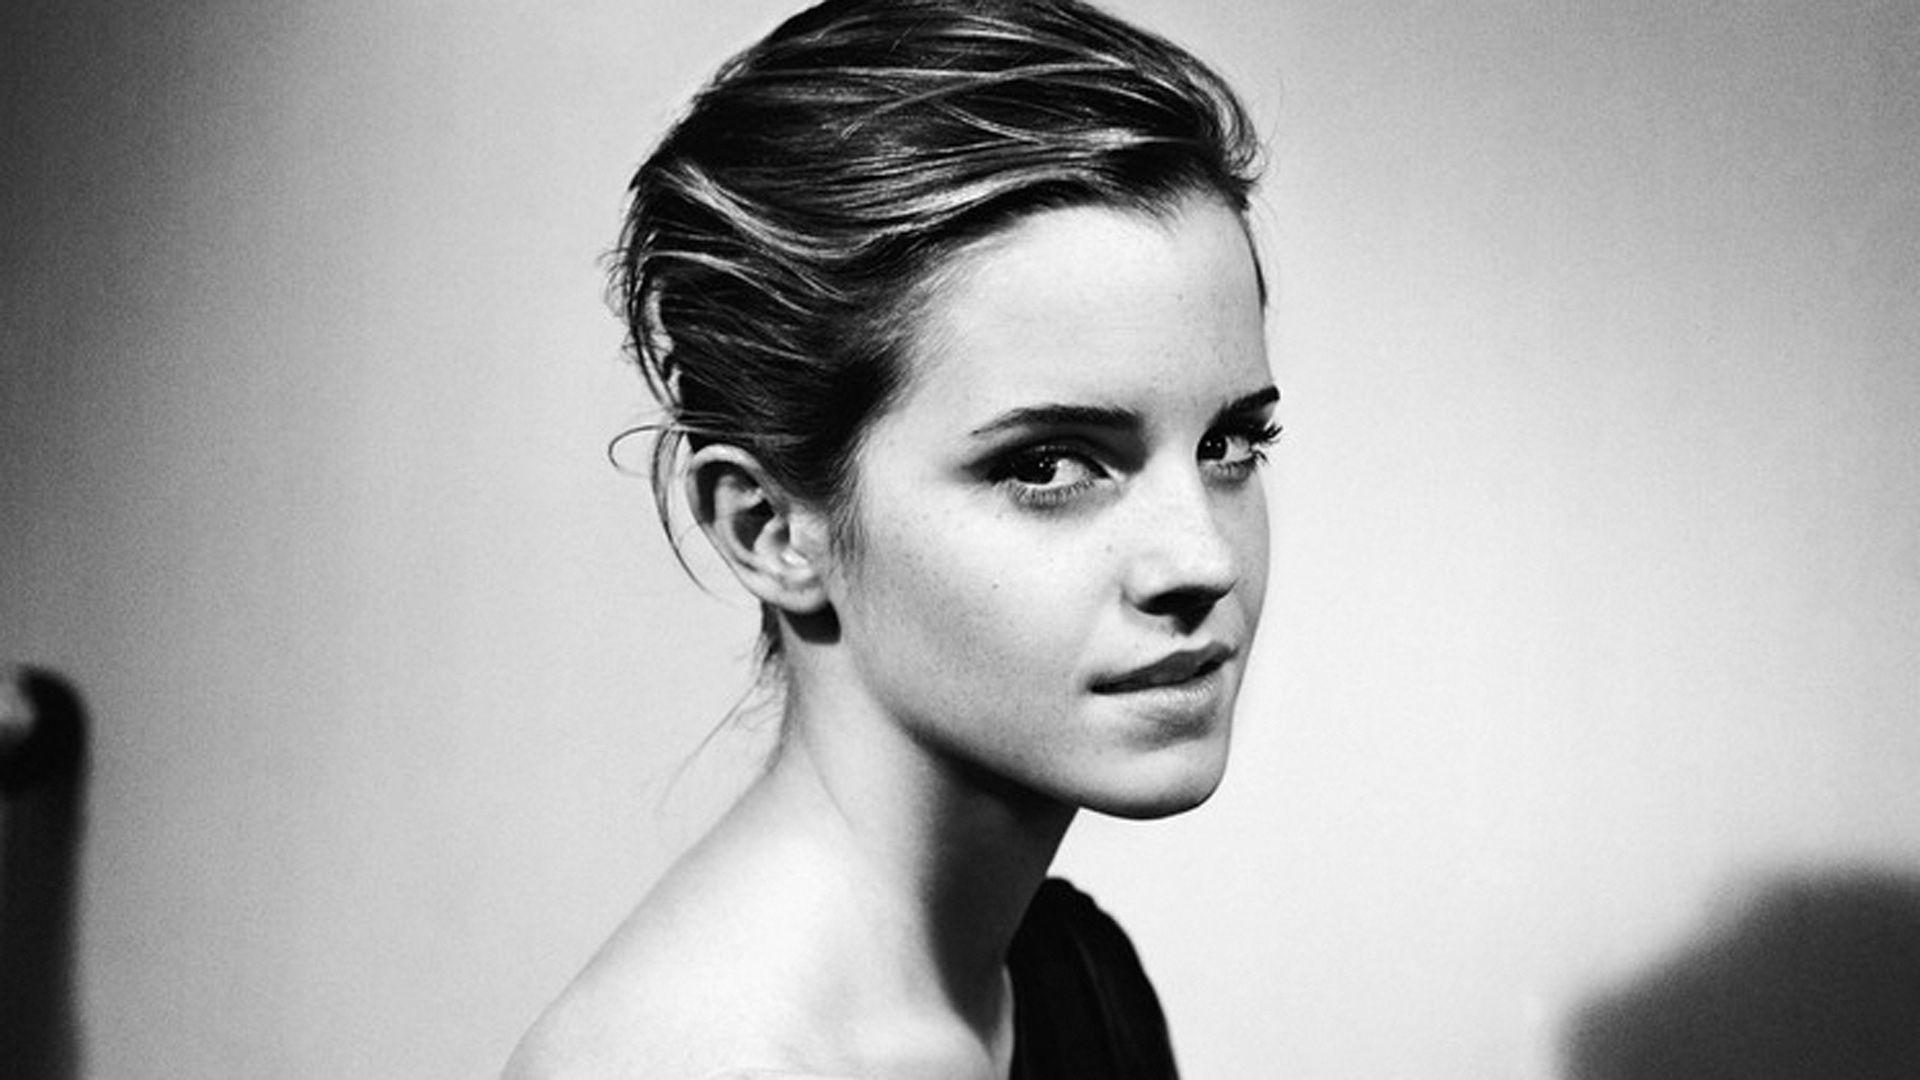 Pin By Gchas On Inspirations Emma Watson Attractive Women Intelligent Women